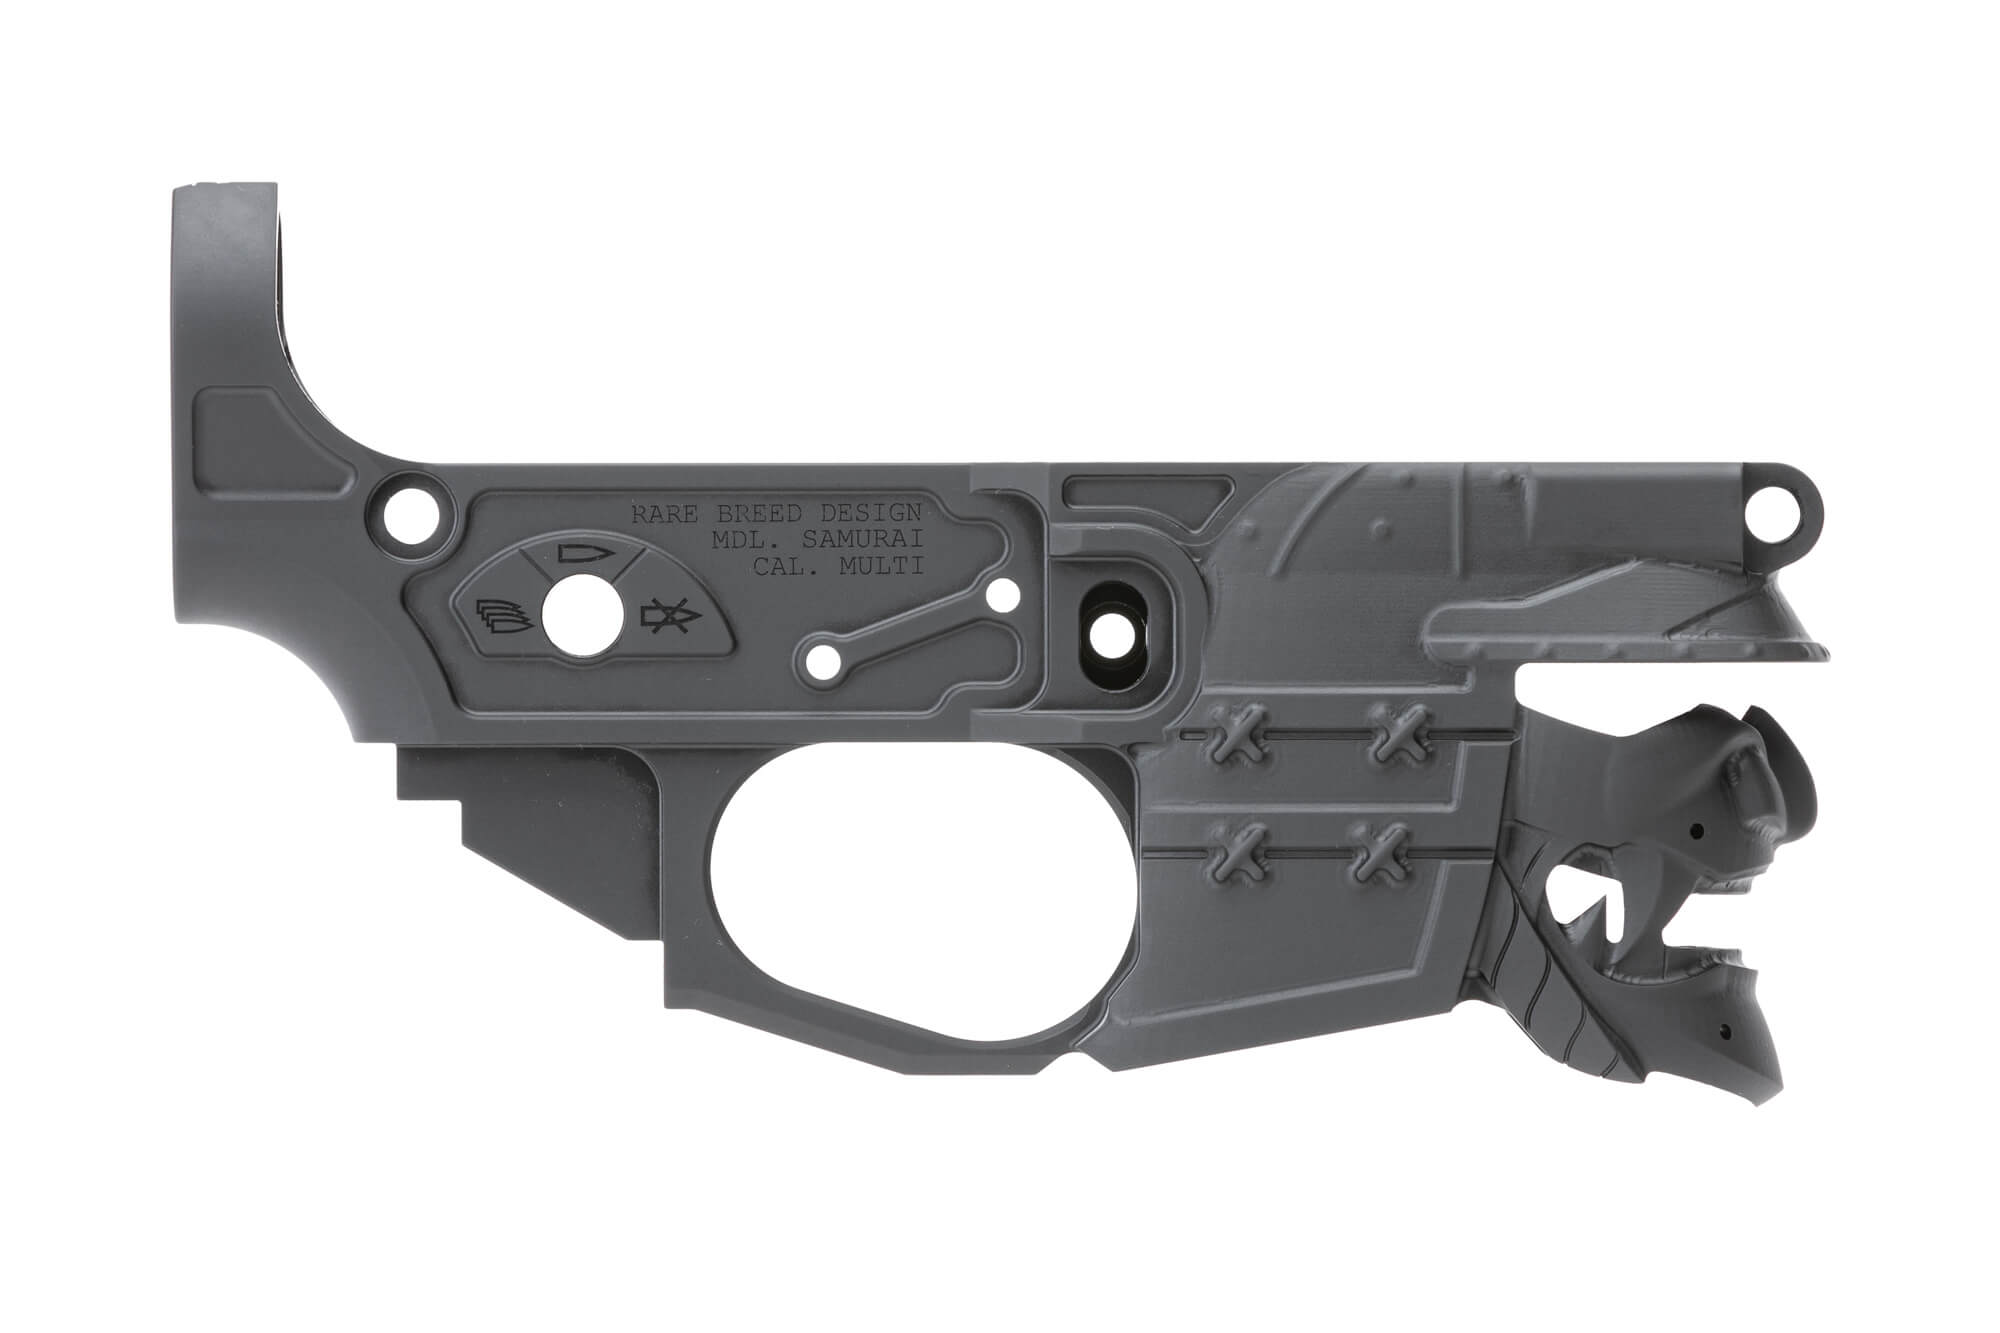 spikes tactical rare breed firearms samurai ar-15 ar15 lower receiver